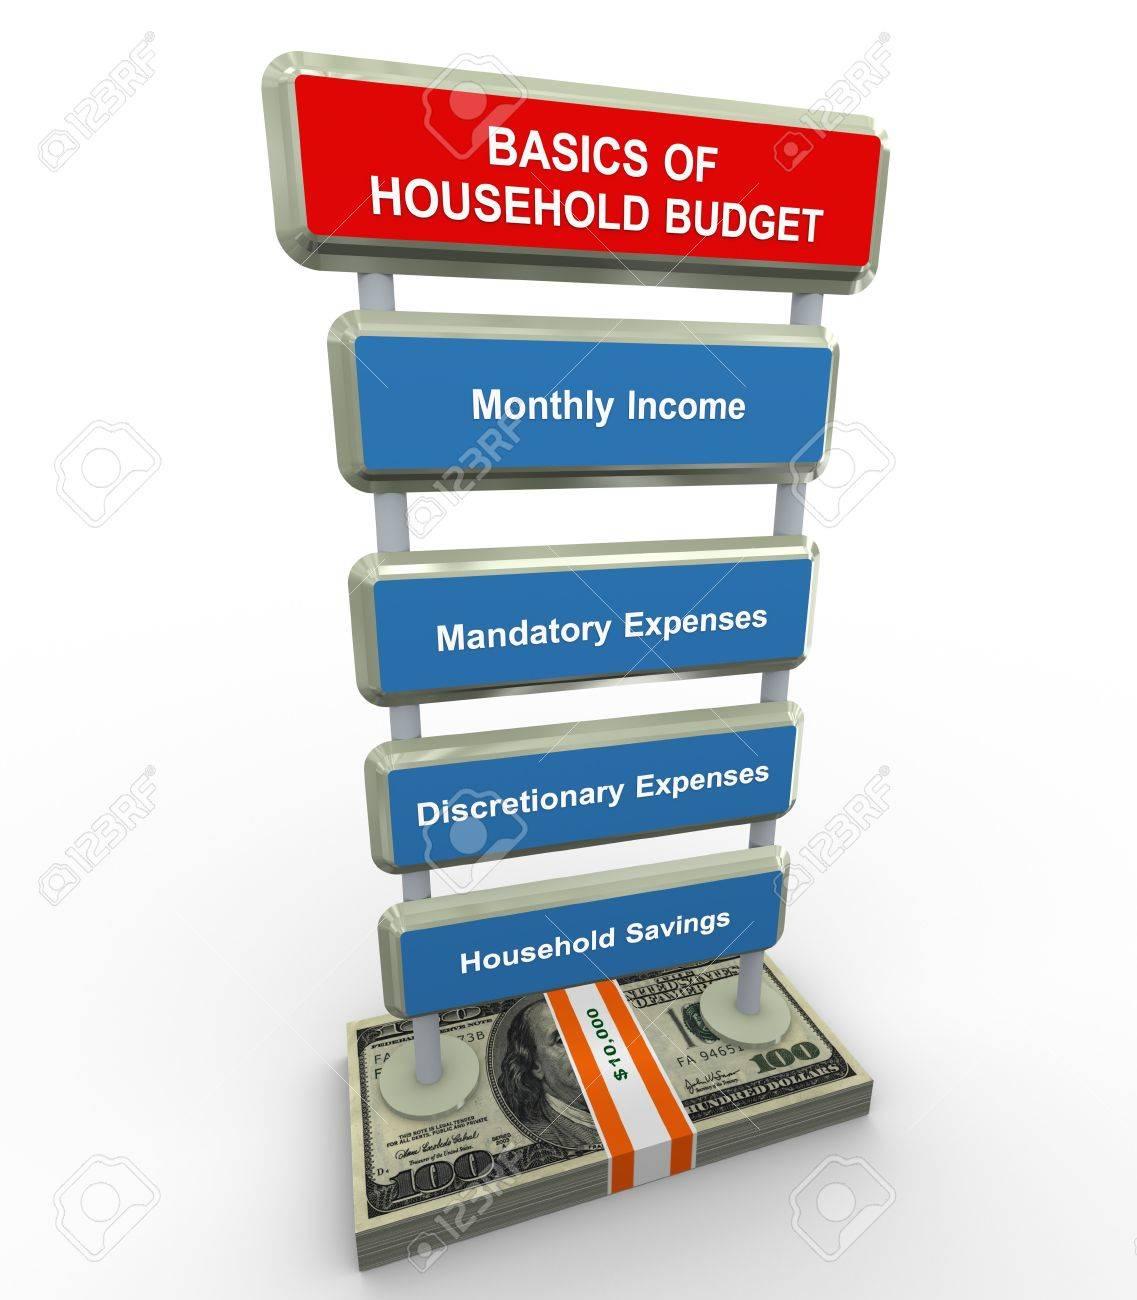 3d render of household budget basics concept Stock Photo - 11404257